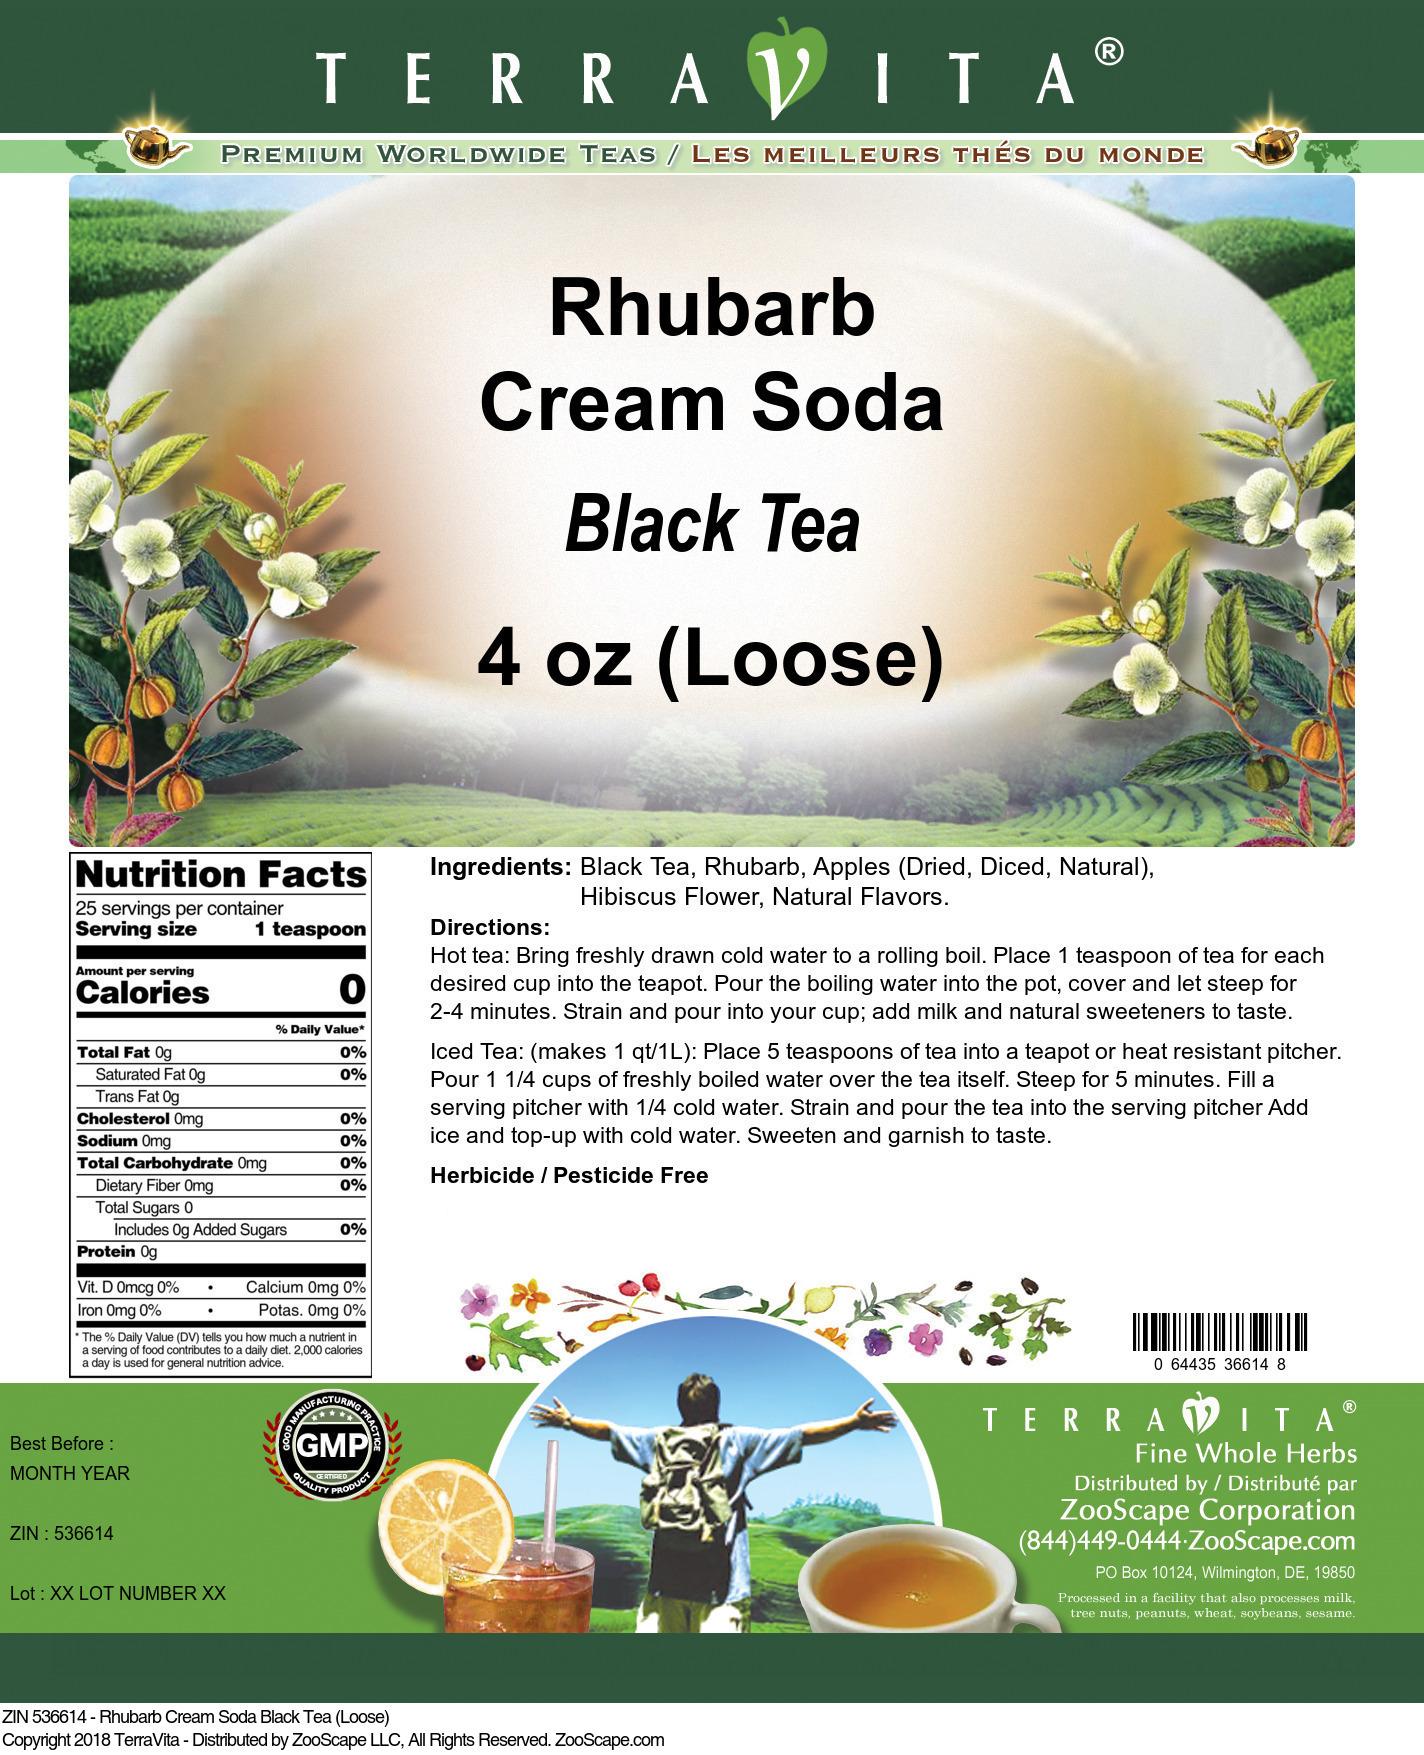 Rhubarb Cream Soda Black Tea (Loose)